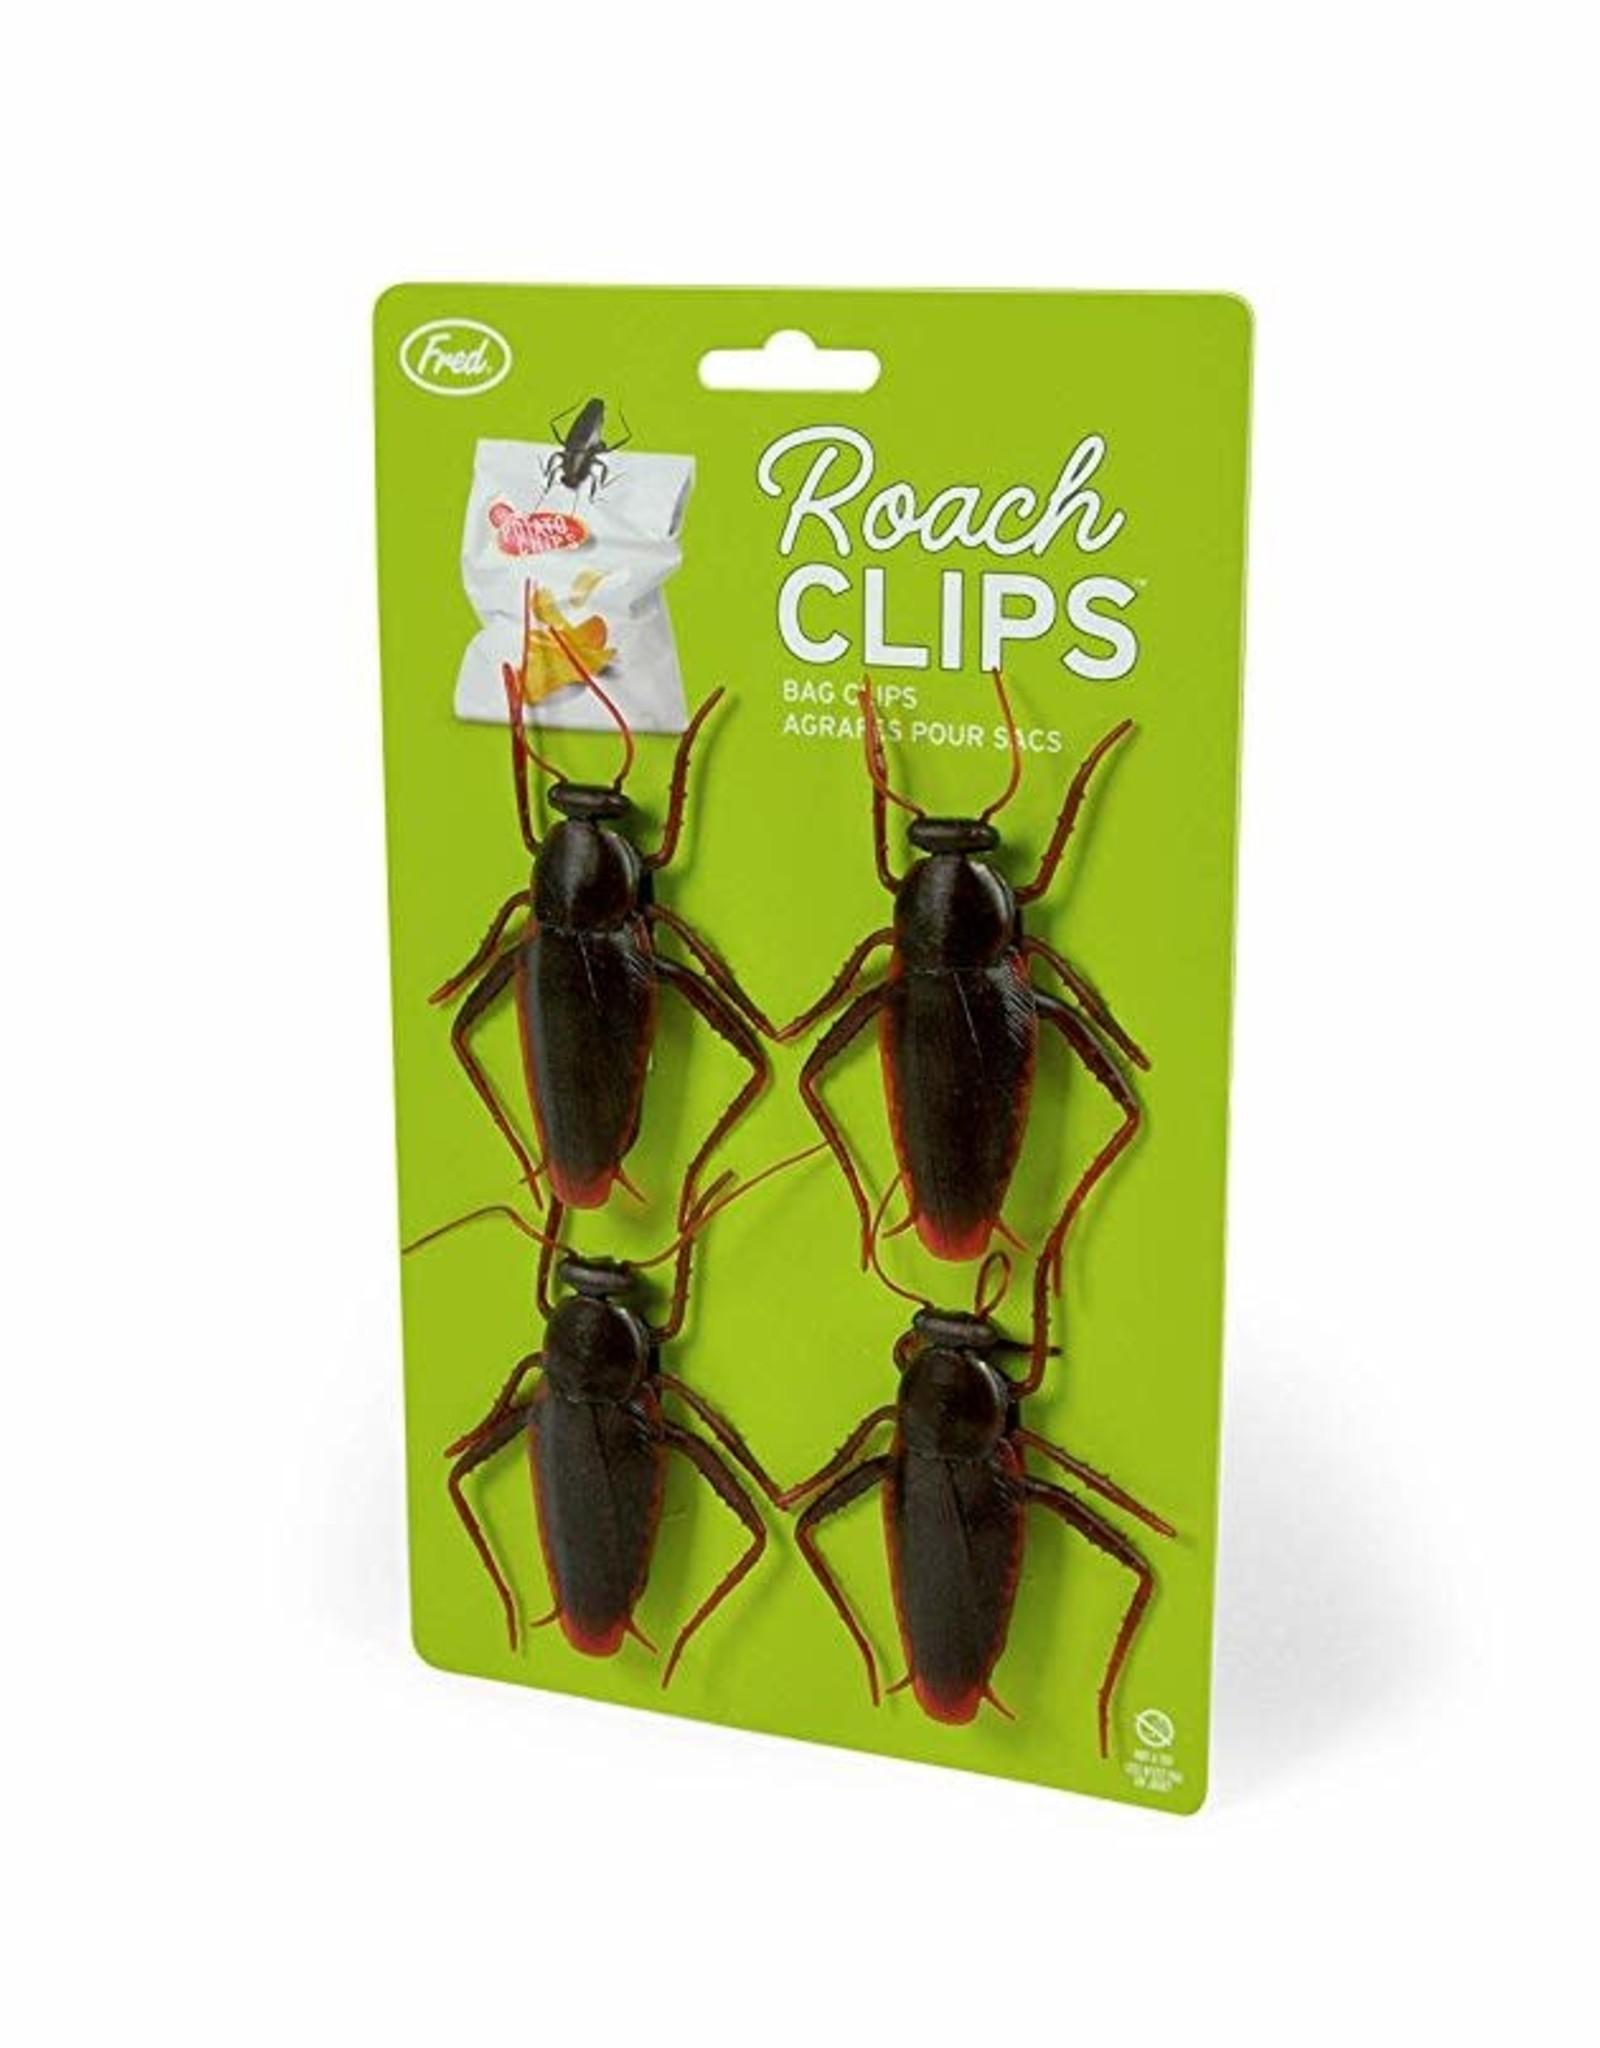 Bag Clips - Roaches